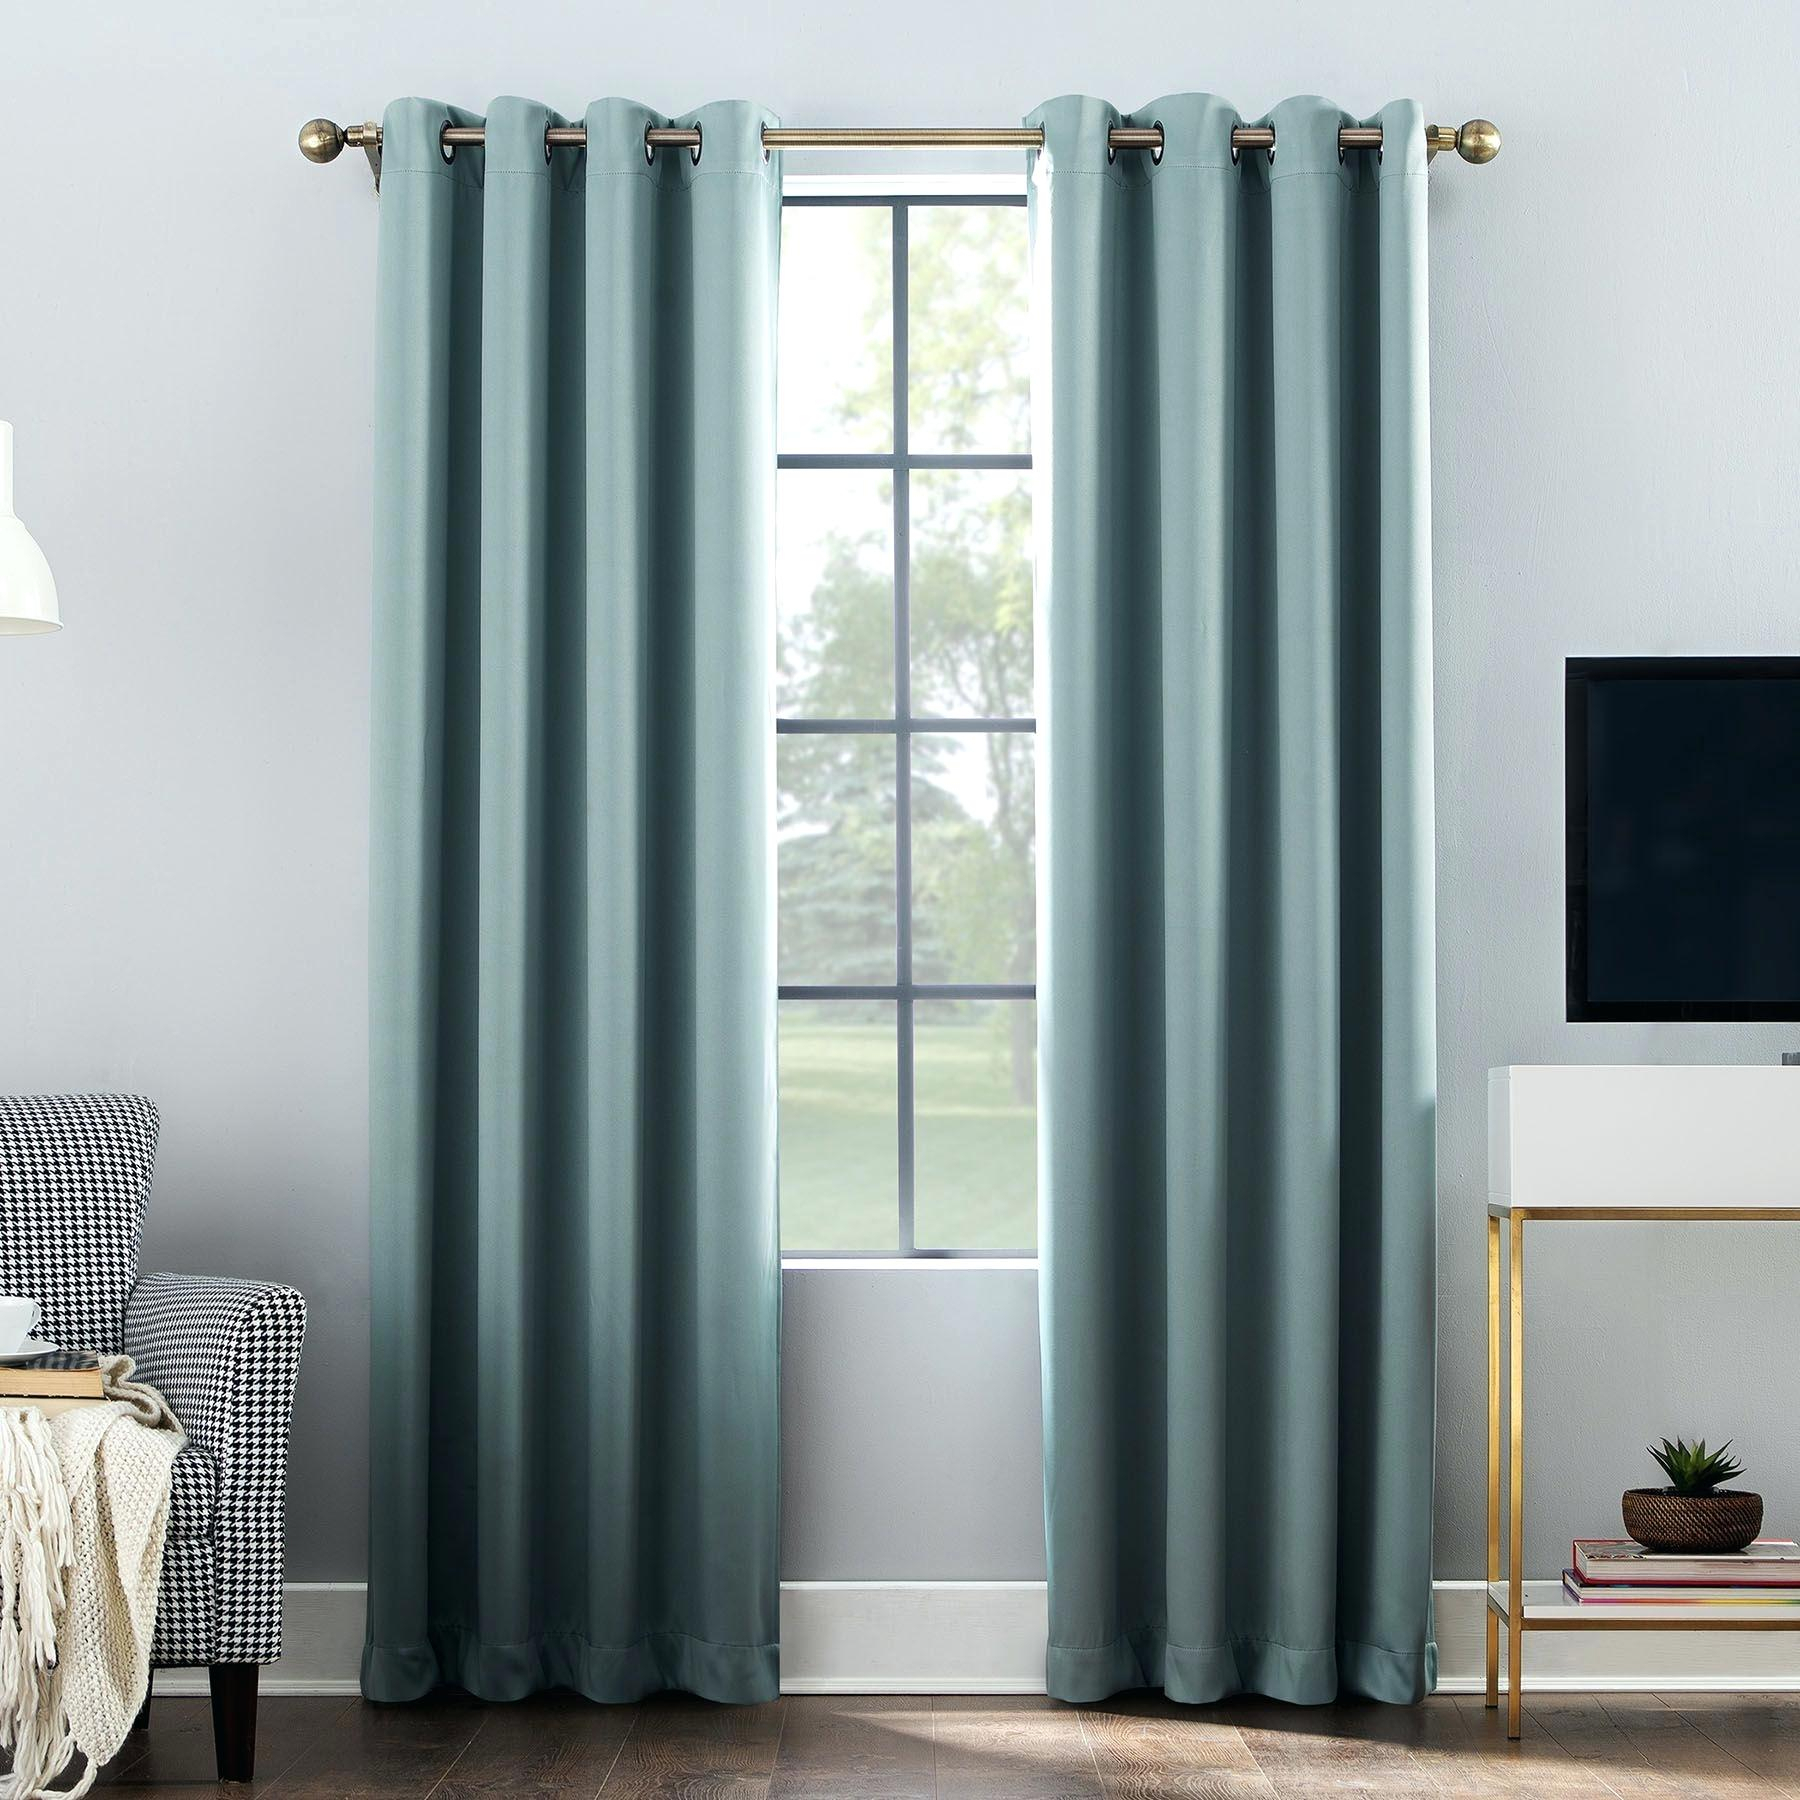 Marvellous Grommet Curtains Outdoor On Sale Blackout Diy In Ultimate Blackout Short Length Grommet Curtain Panels (View 11 of 30)